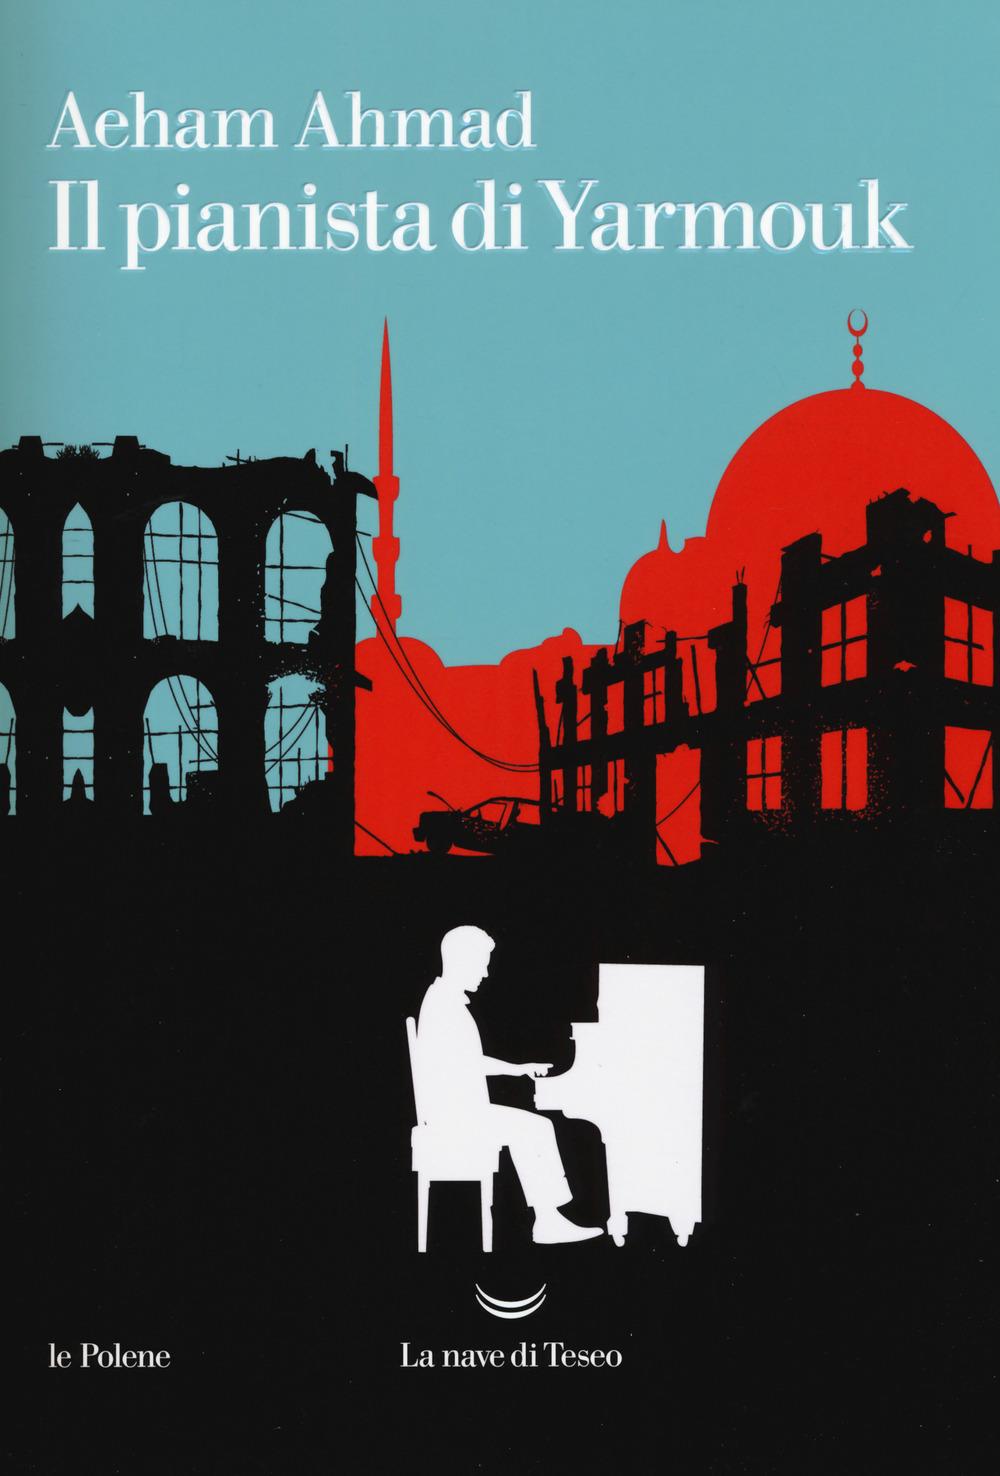 Aeham Ahmad - Il pianista di Yarmouk 2 - fanzine